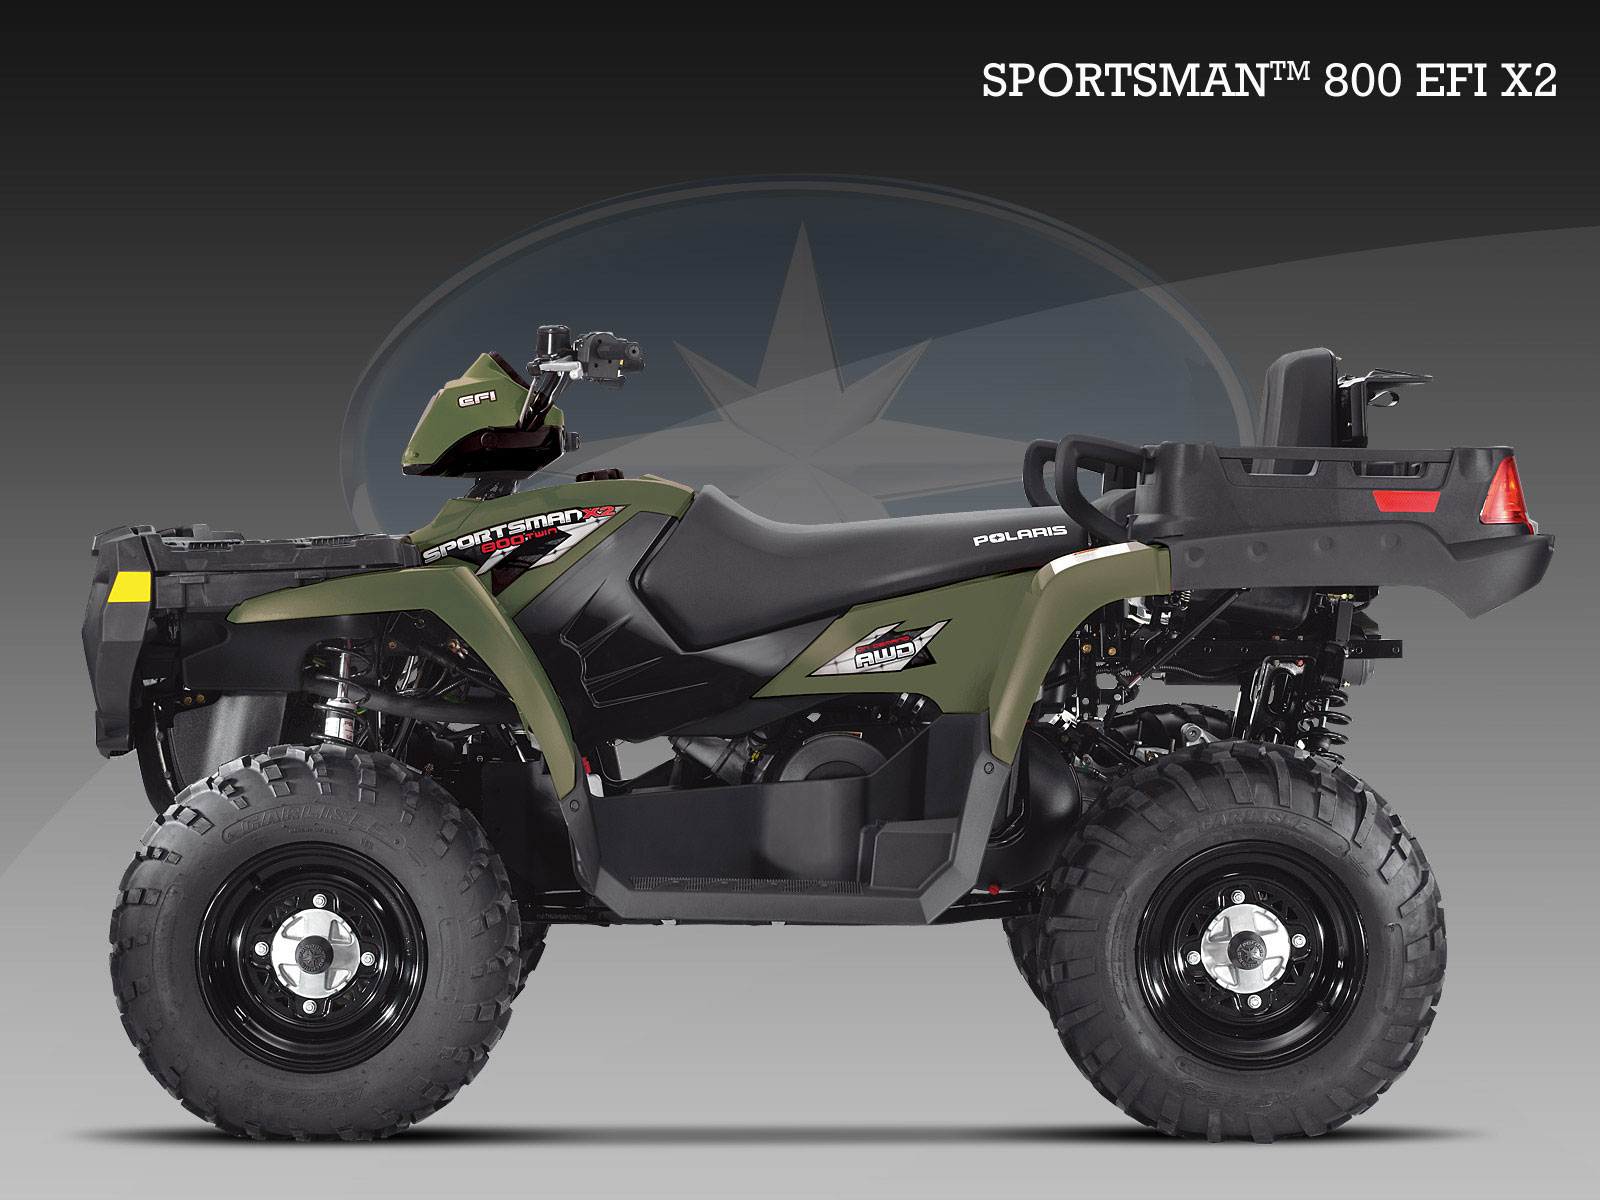 quad polaris sportsman x2 800 efi